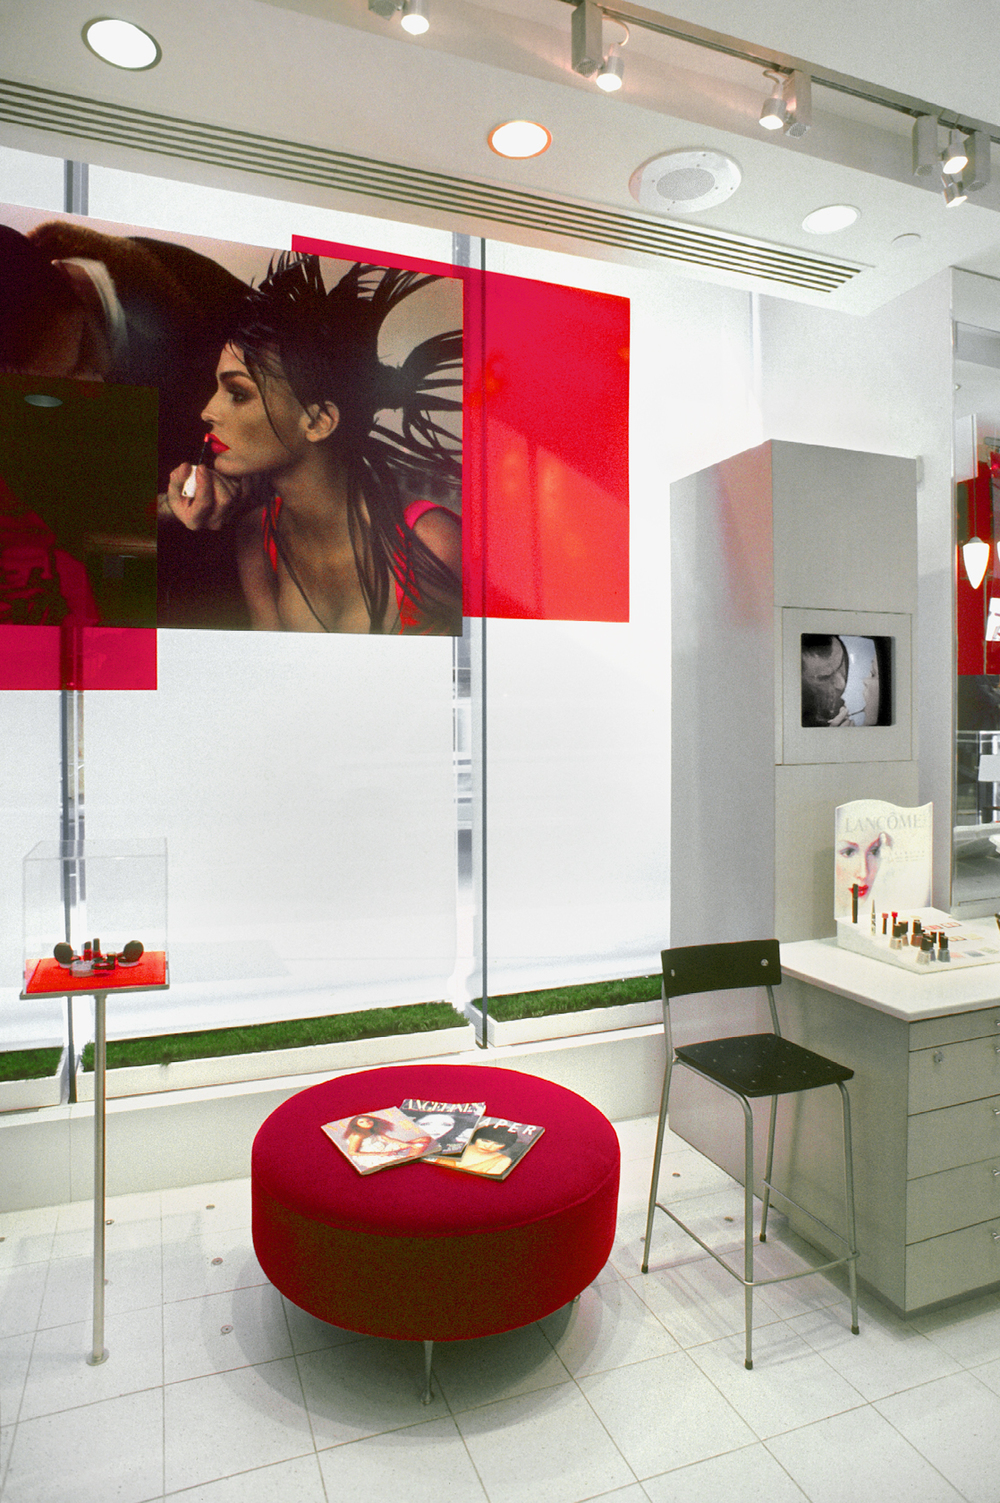 Lancome. Tobin Parnes Design. NY. Retail Design. Lounge Area.